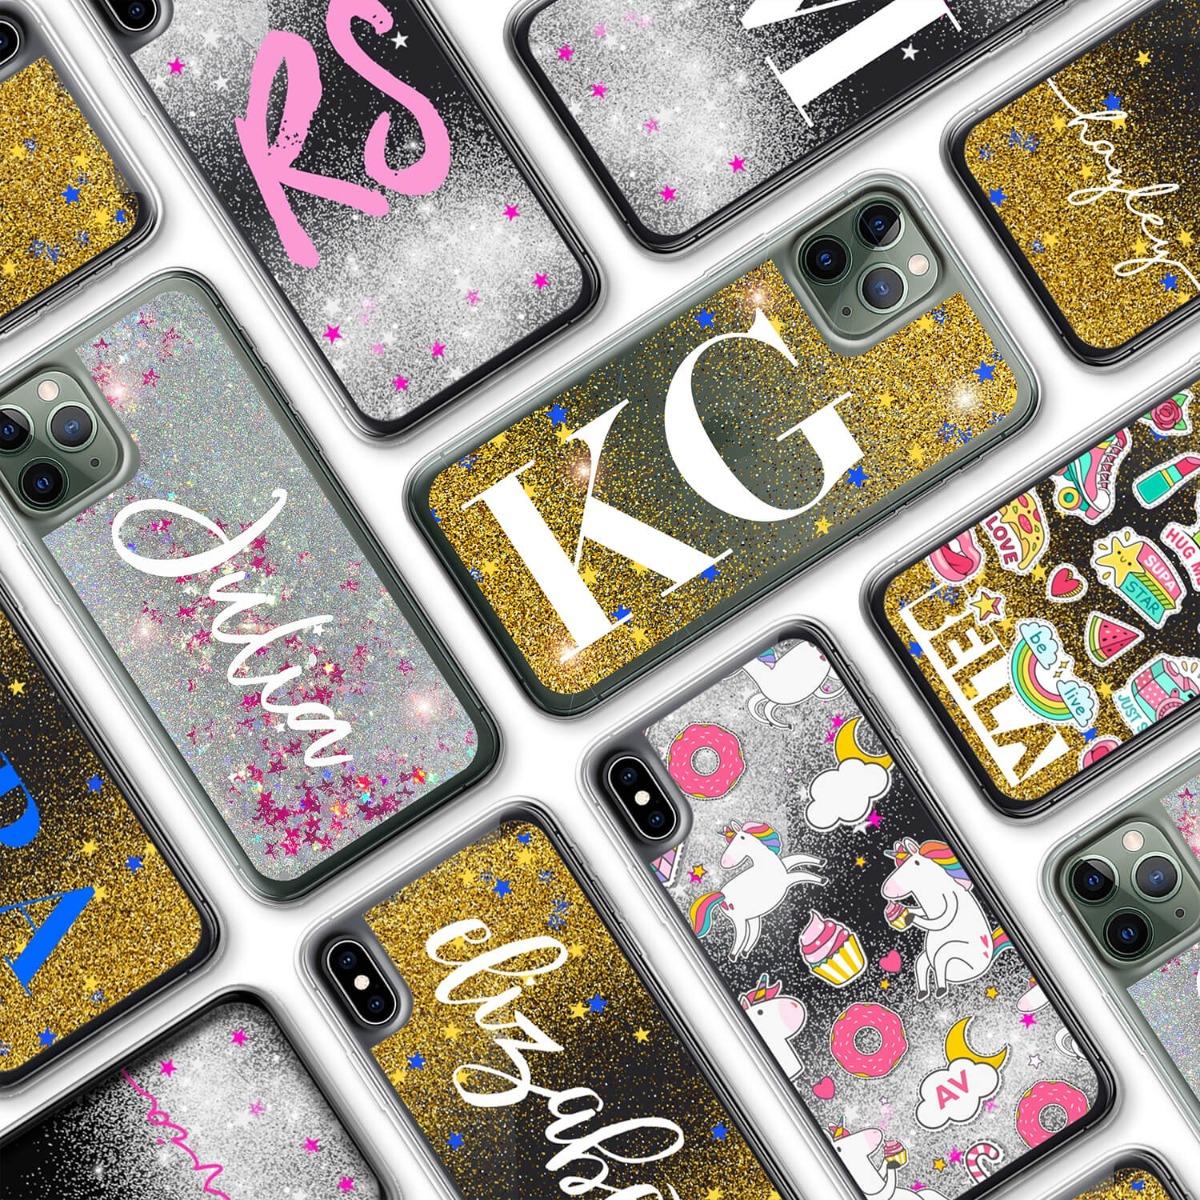 Galaxy S10 5G Glitter Case 16226